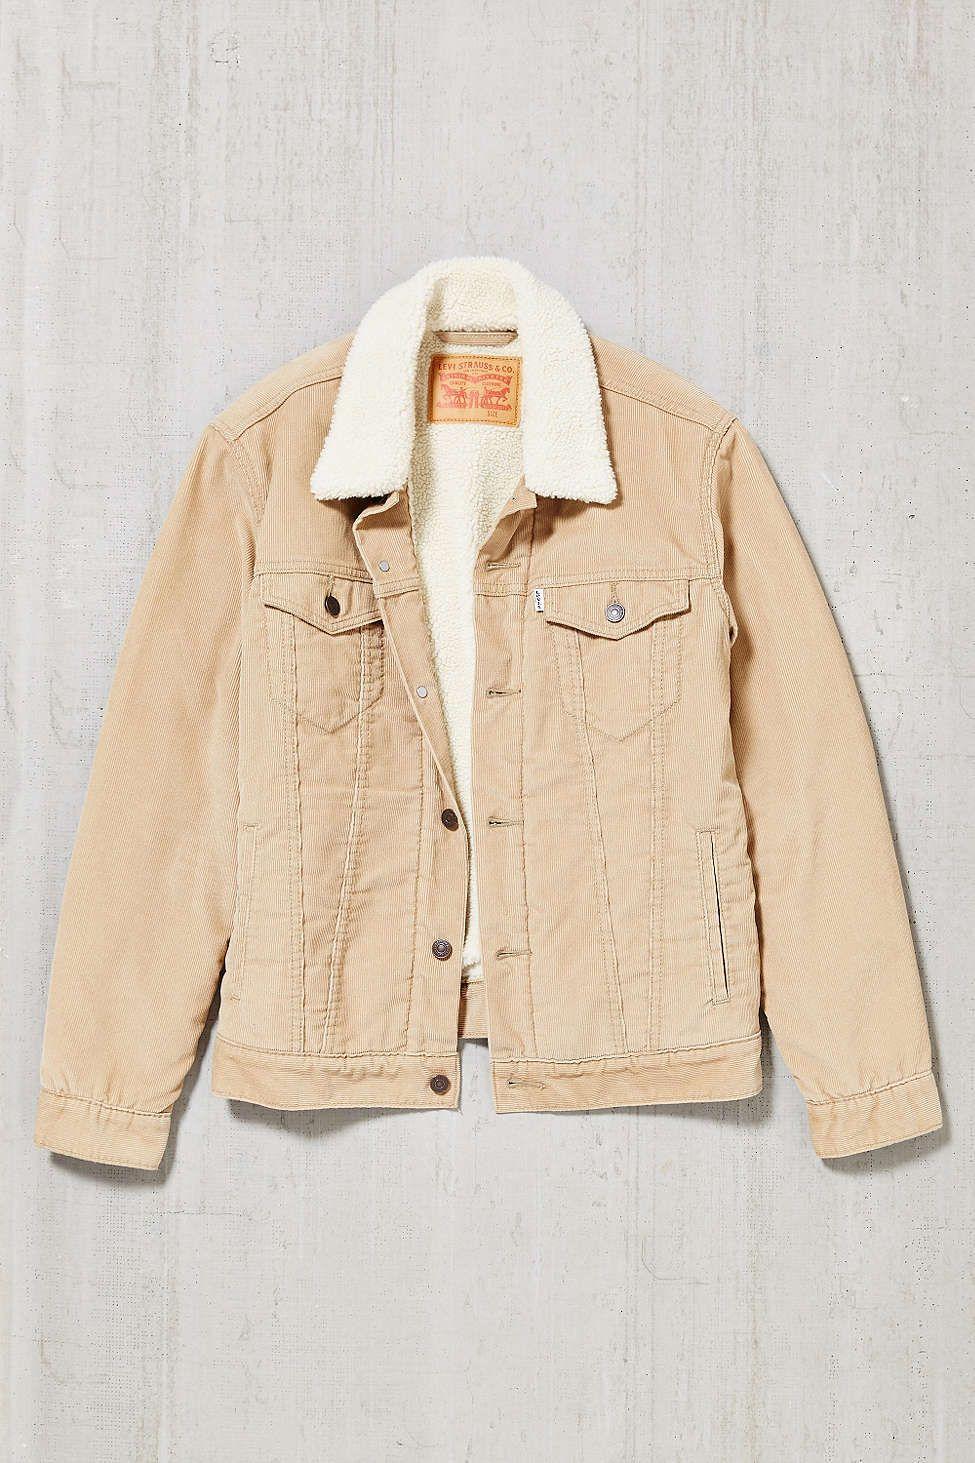 Levis Corduroy Sherpa Trucker Jacket - Urban Outfitters ce619ff3093